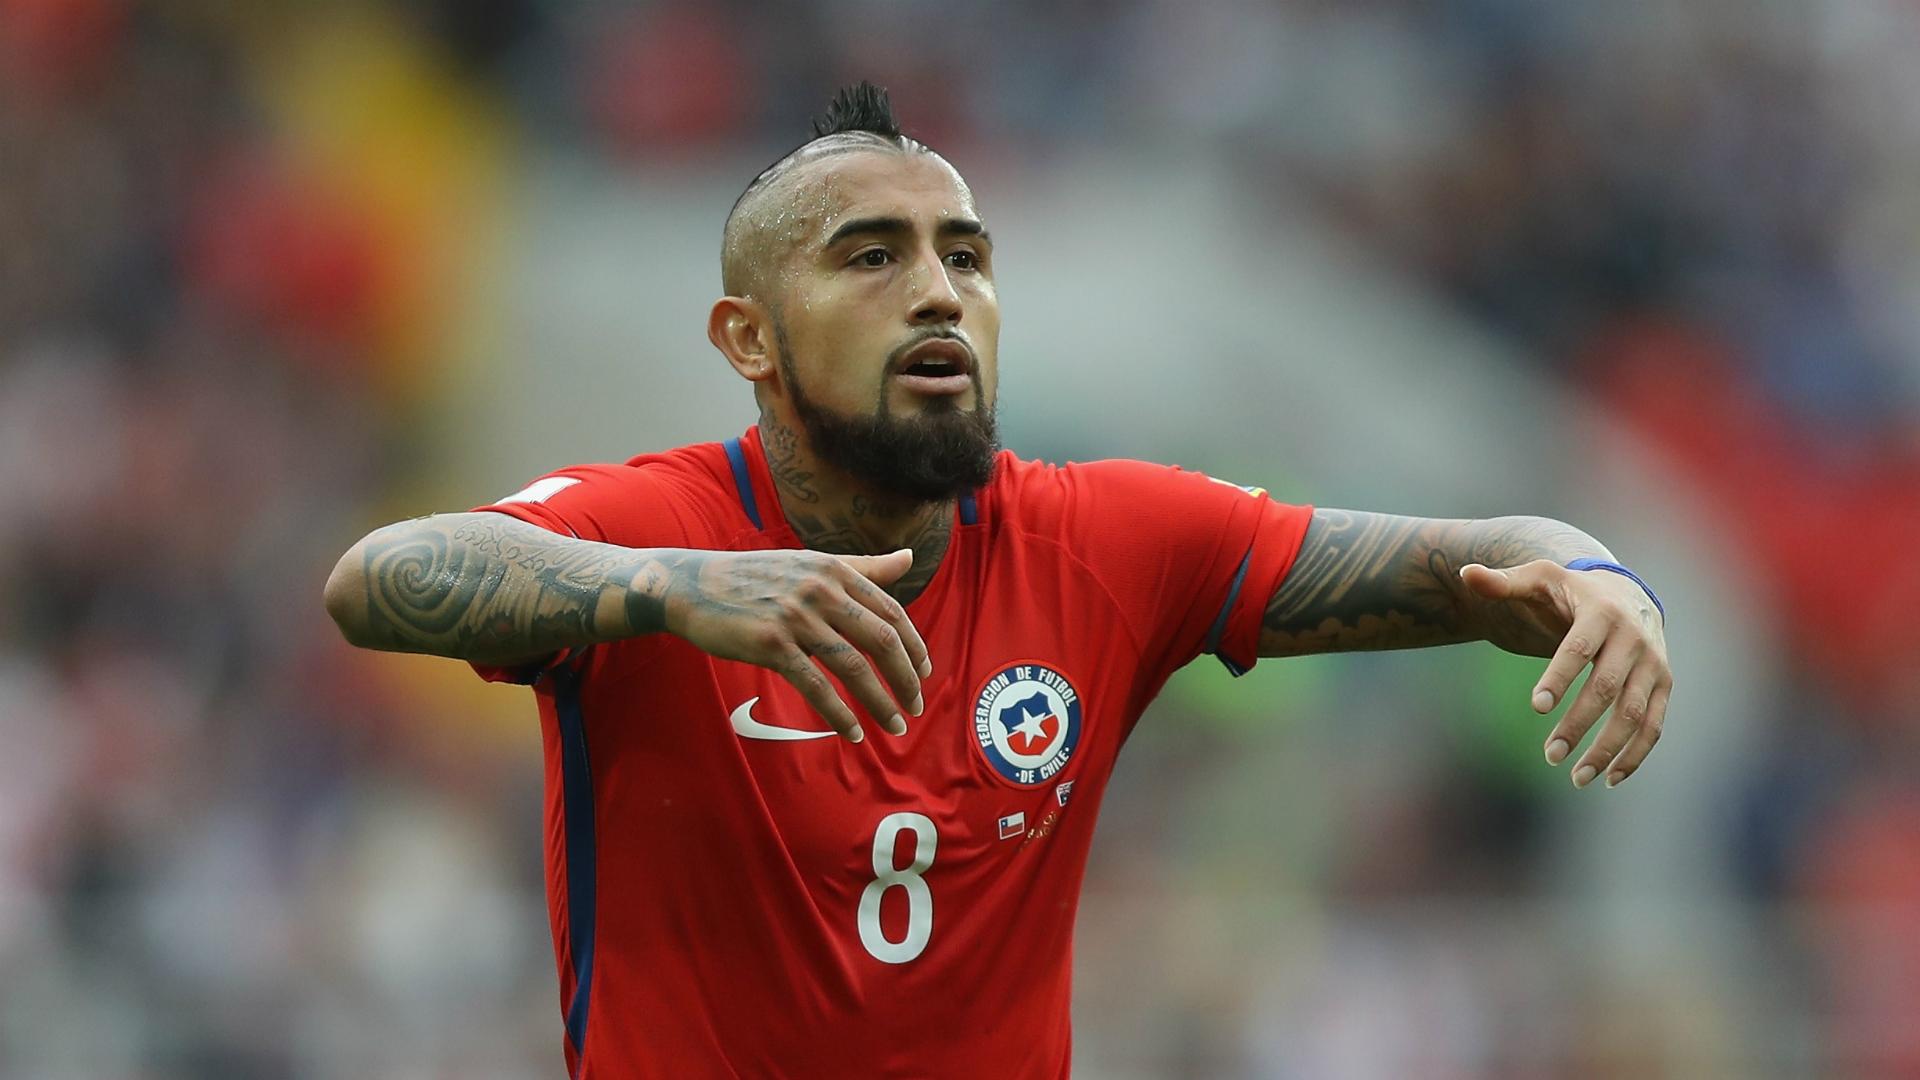 Arturo Vidal Chile FIFA Confederations Cup 2017